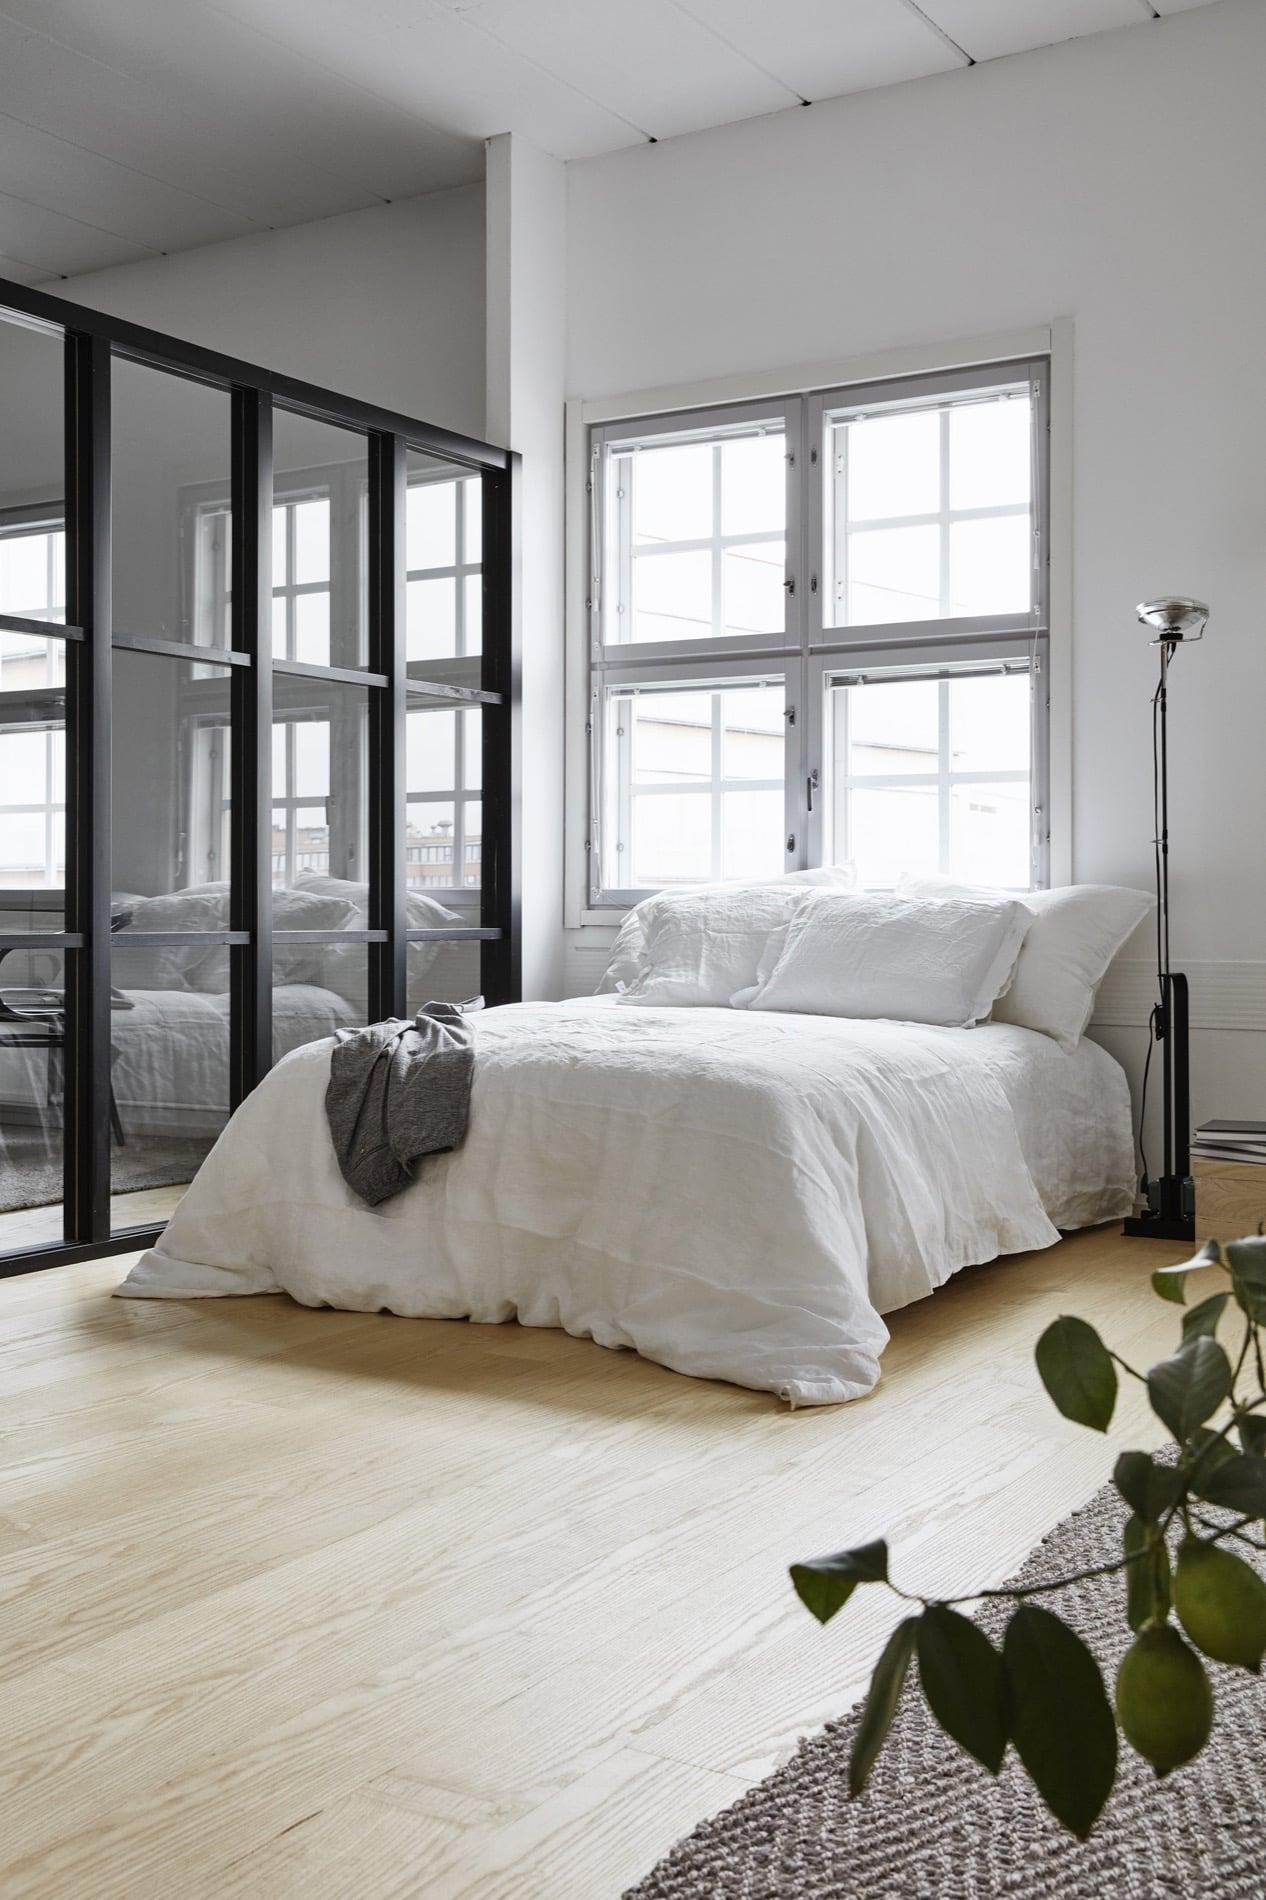 Timberwise-parketti-puulattia-wooden-floor-parquet-Saarni-Ash-Select-îljyvaha-wax-oil_pysty1